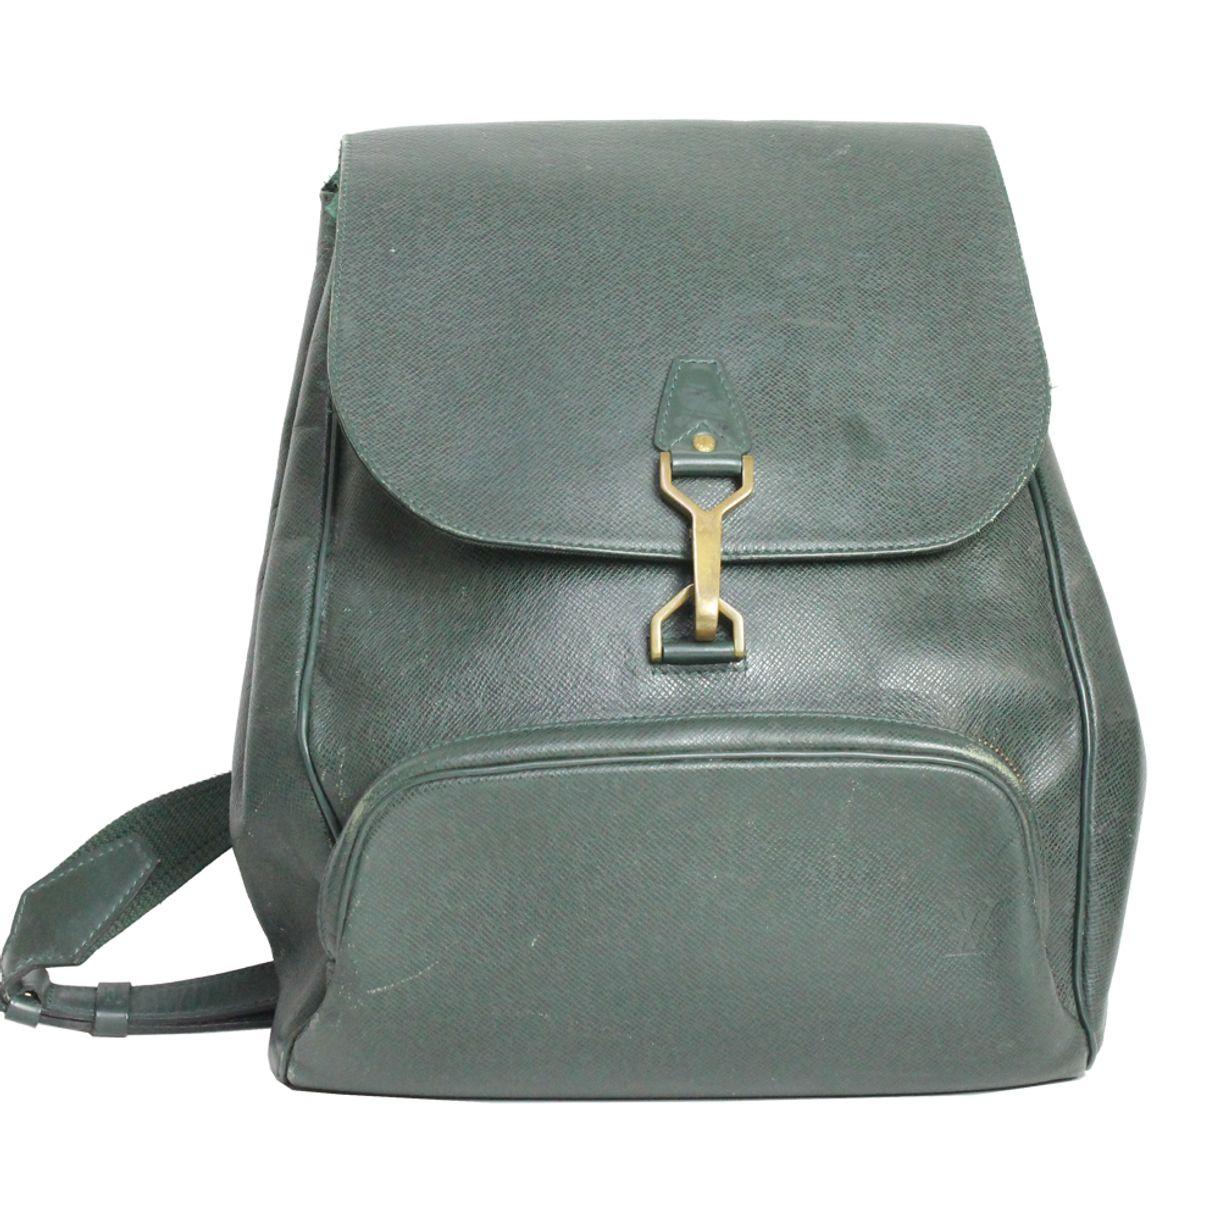 1eb6ff1eaa Mochila Louis Vuitton Couro Verde Vintage